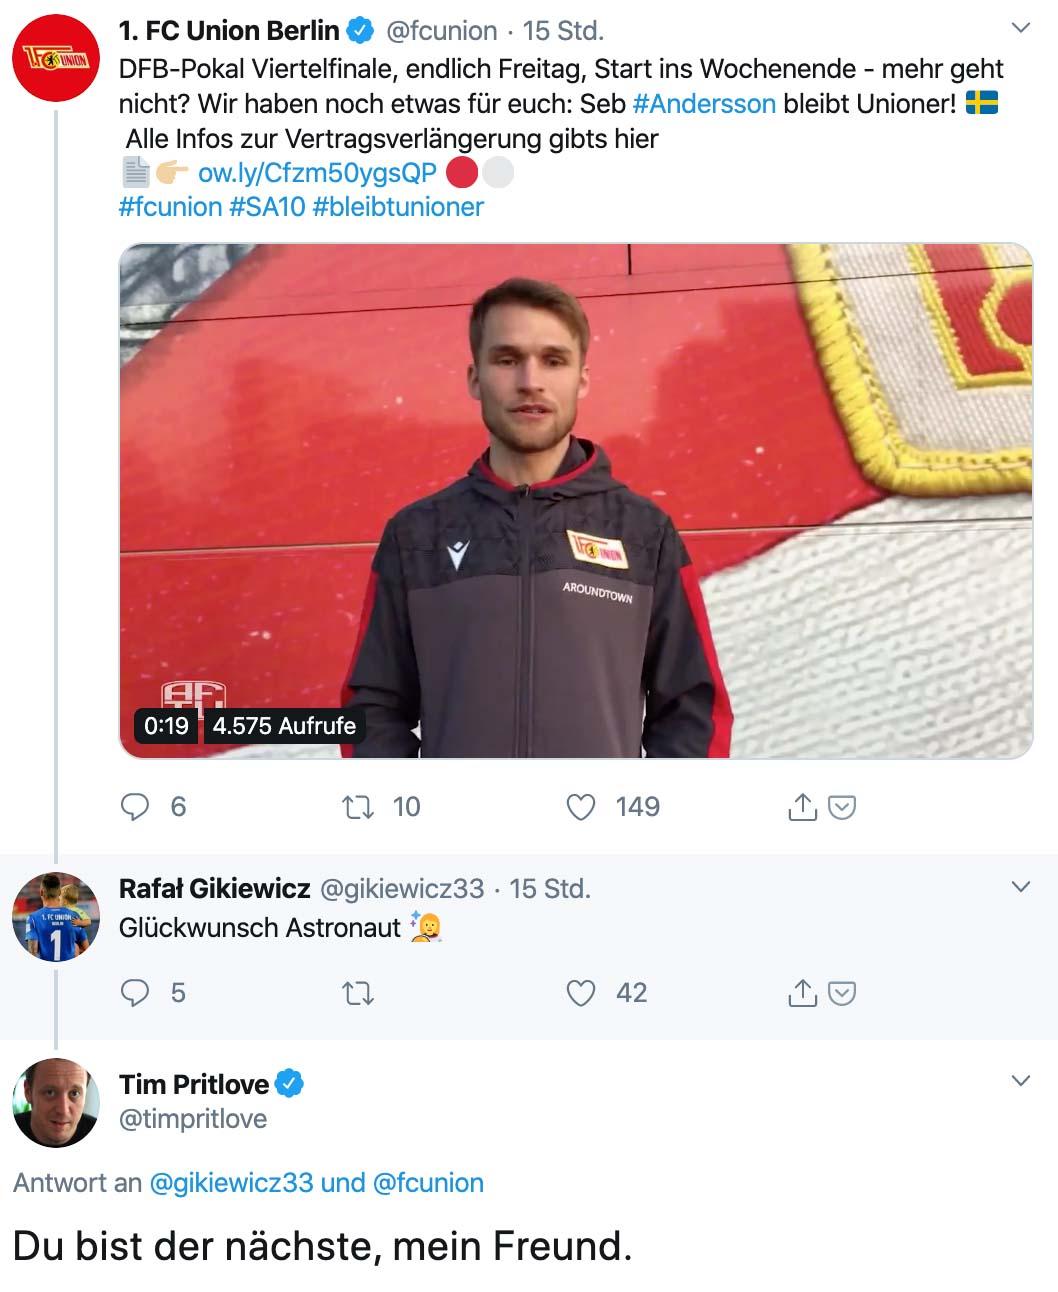 Reaktionen auf Sebastian Anderssons Vertragsverlängerung, Twitter @timpritlove